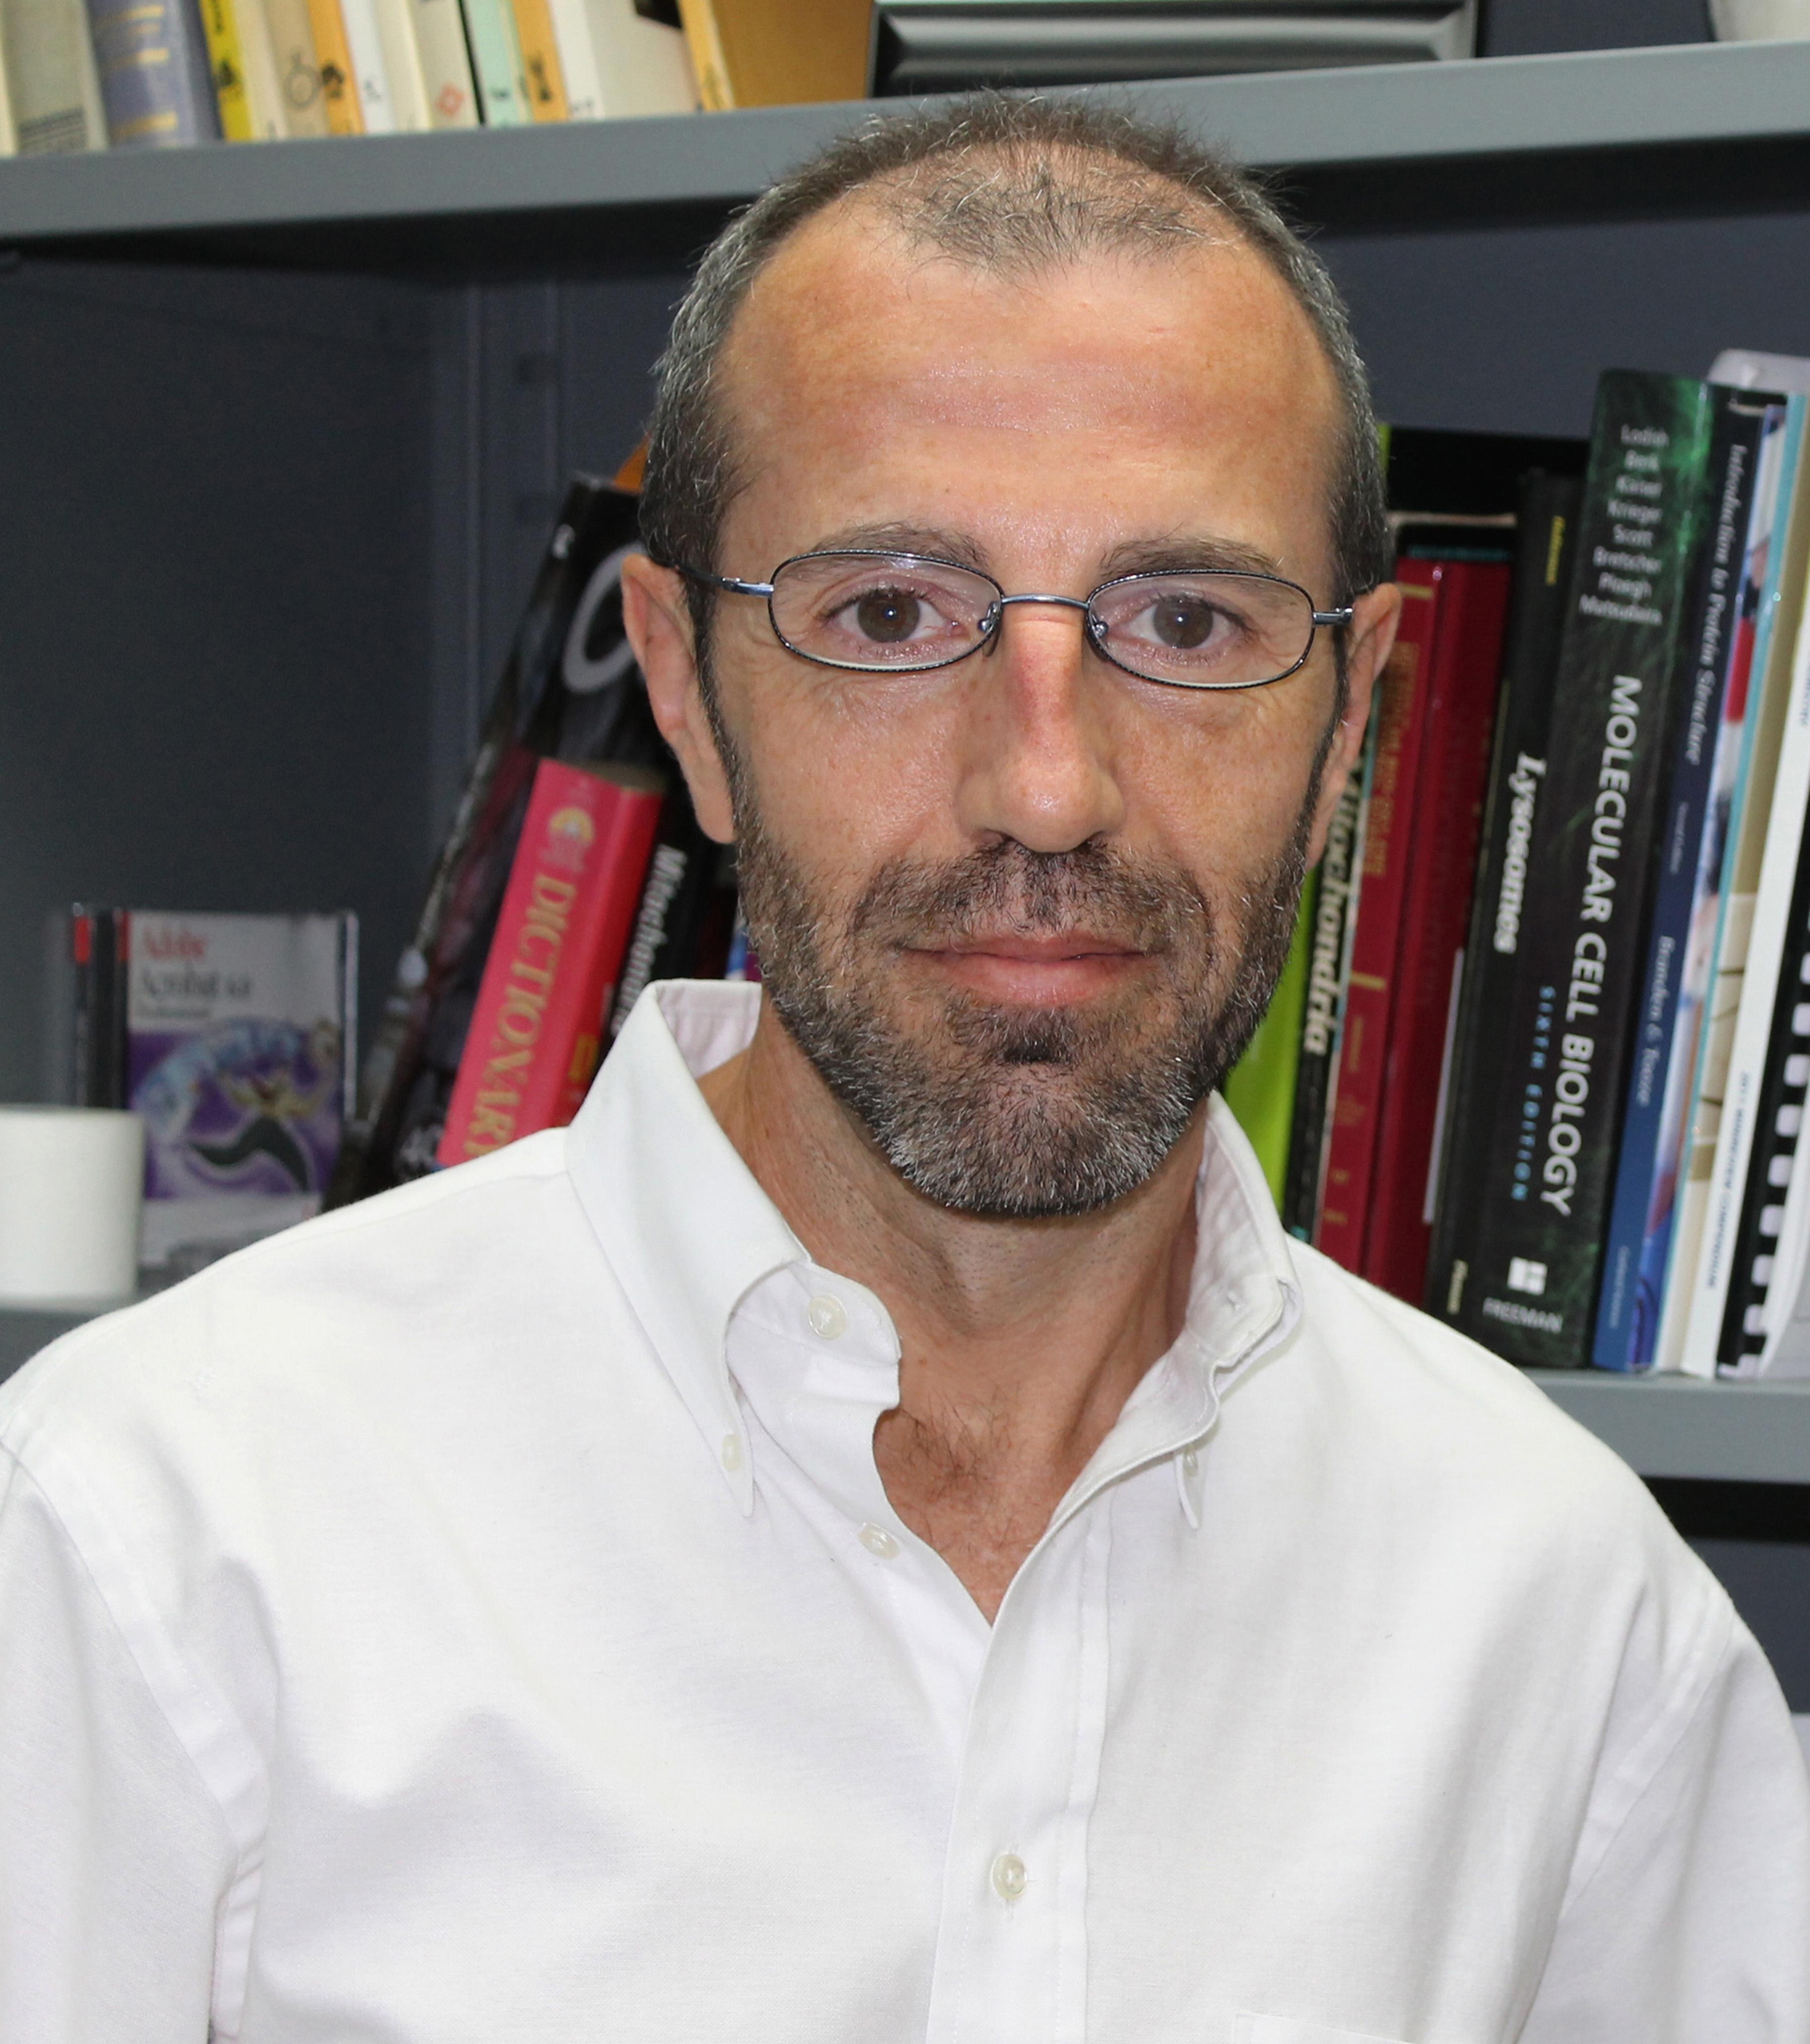 Antoni Barrientos